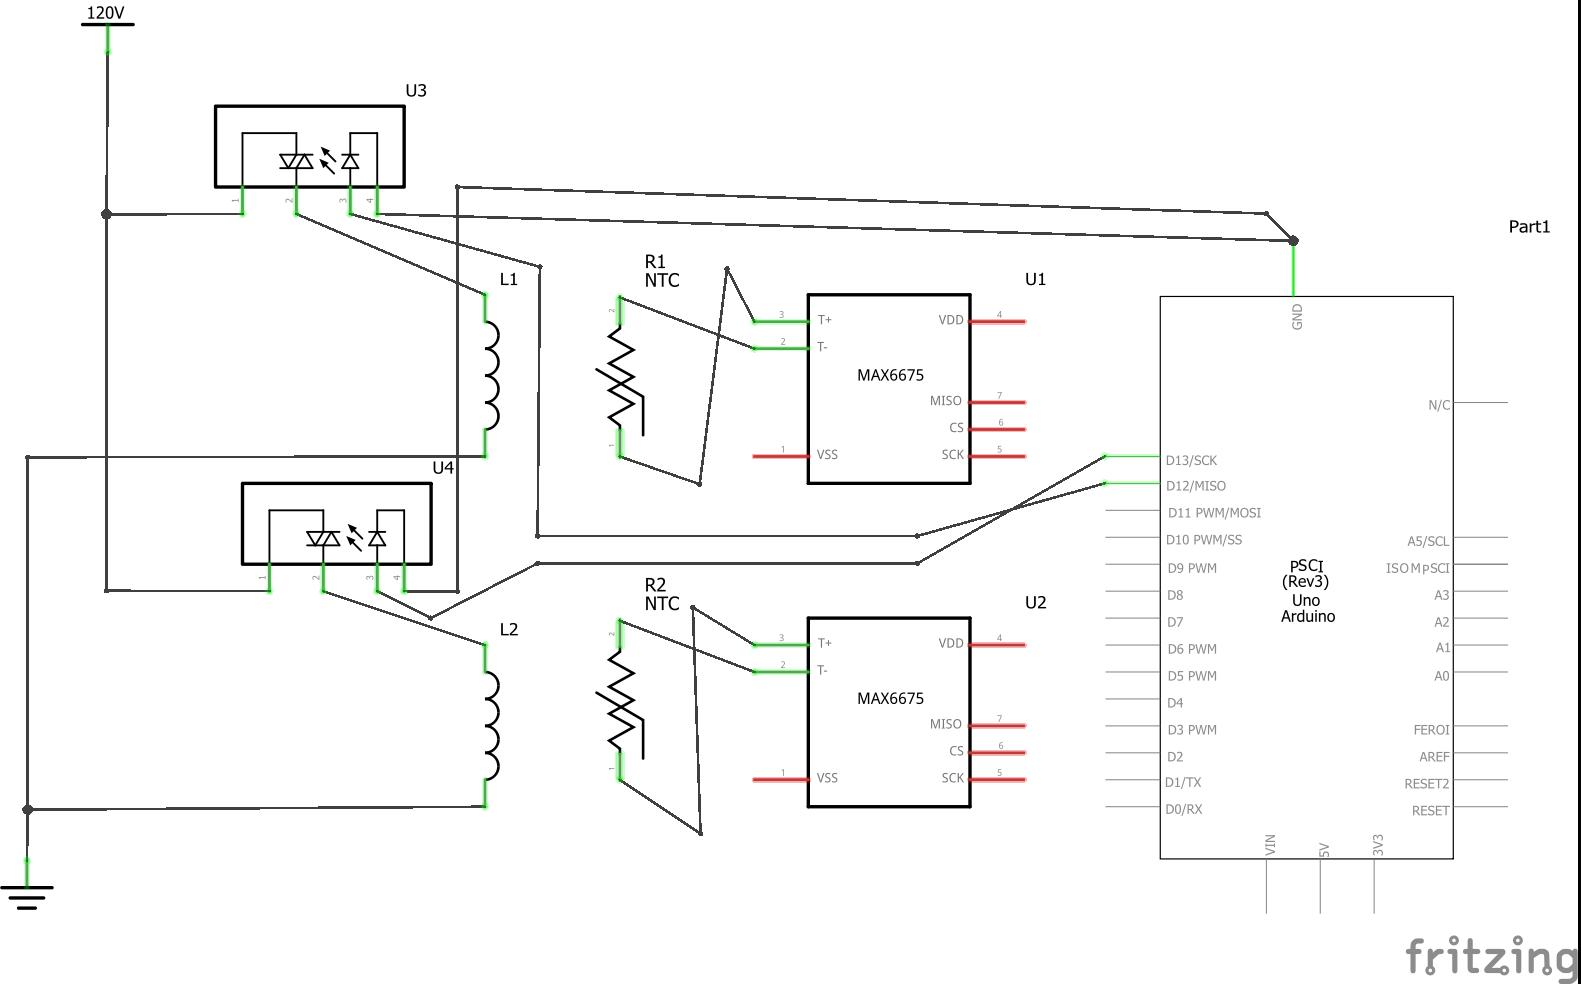 figure: ac side wiring